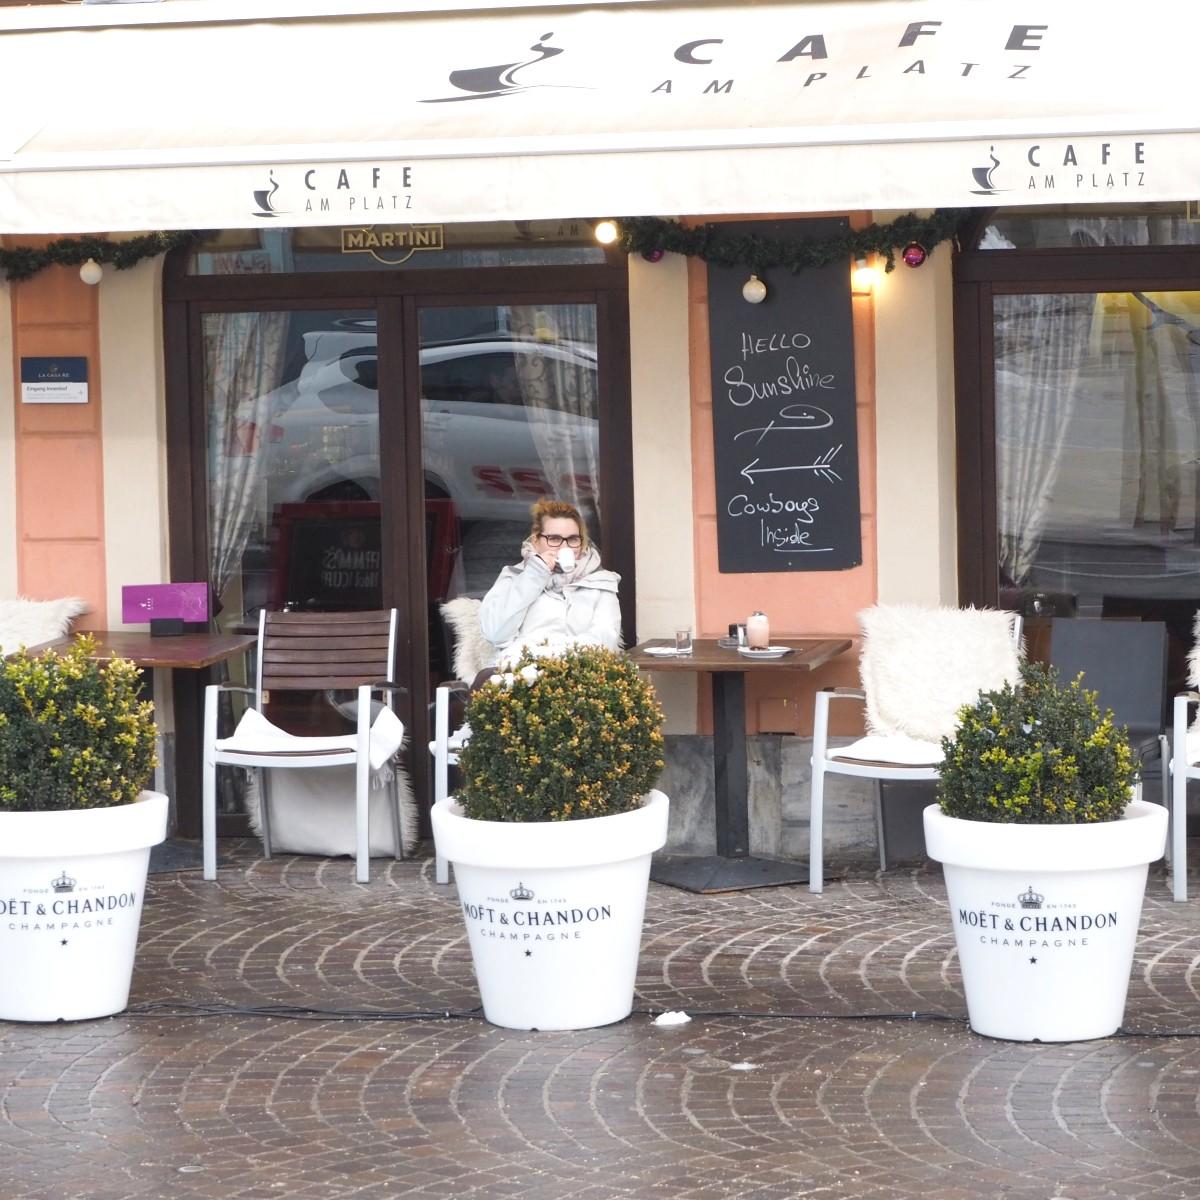 Mellis Kaffeehaustour Kärnten Klagenfurt Cafe am Platz